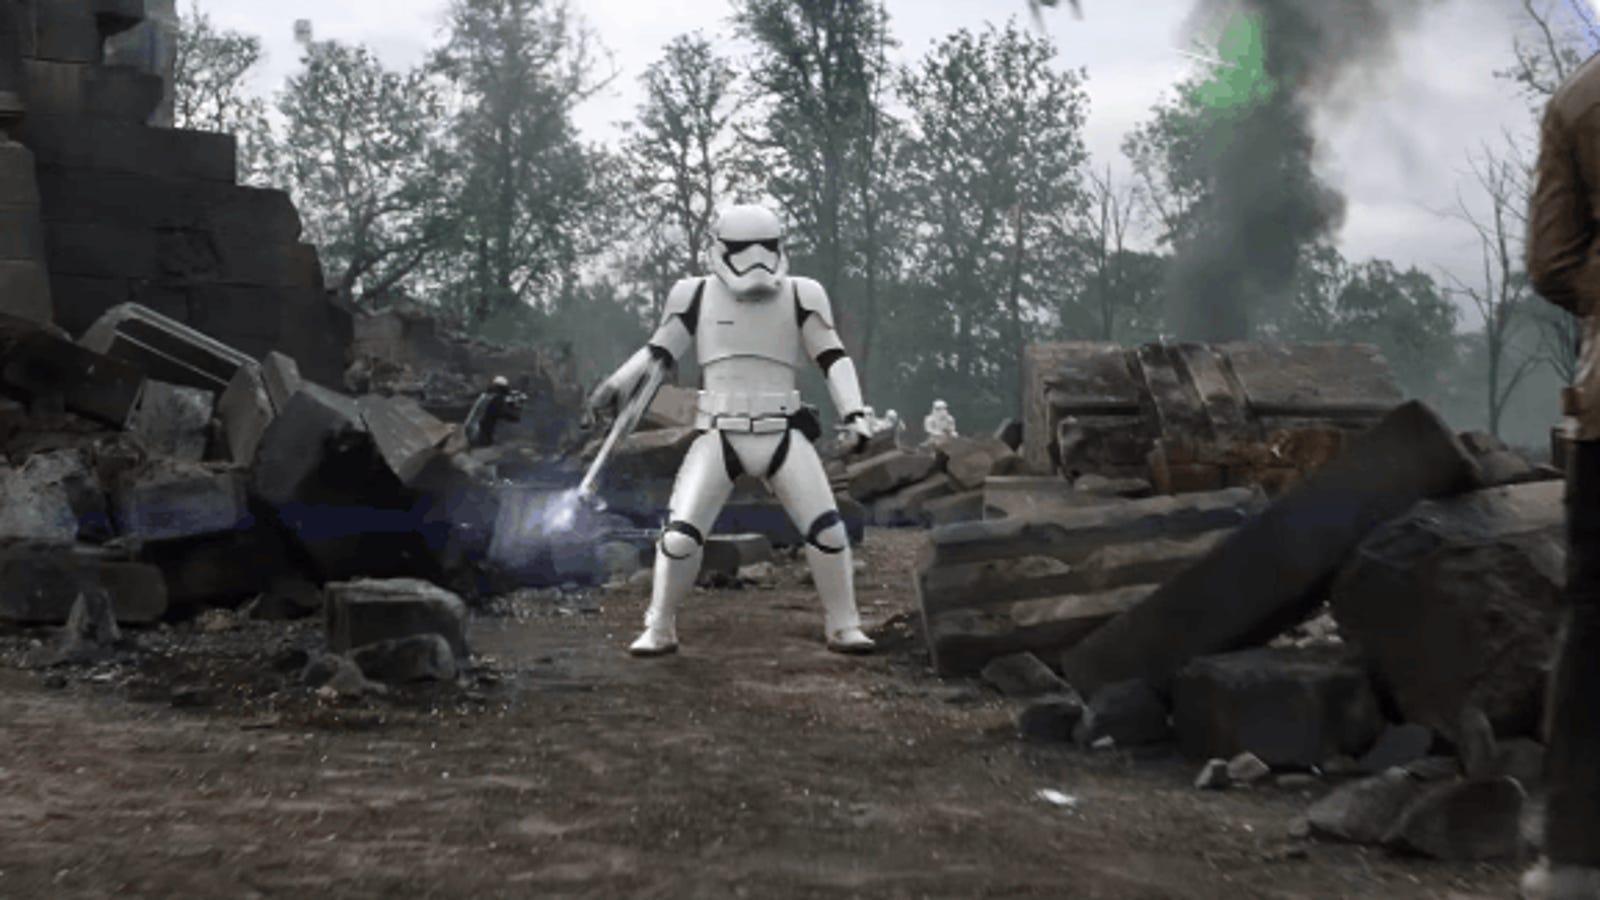 La historia detrás del Stormtrooper más famoso de The Force Awakens que se convirtió en meme